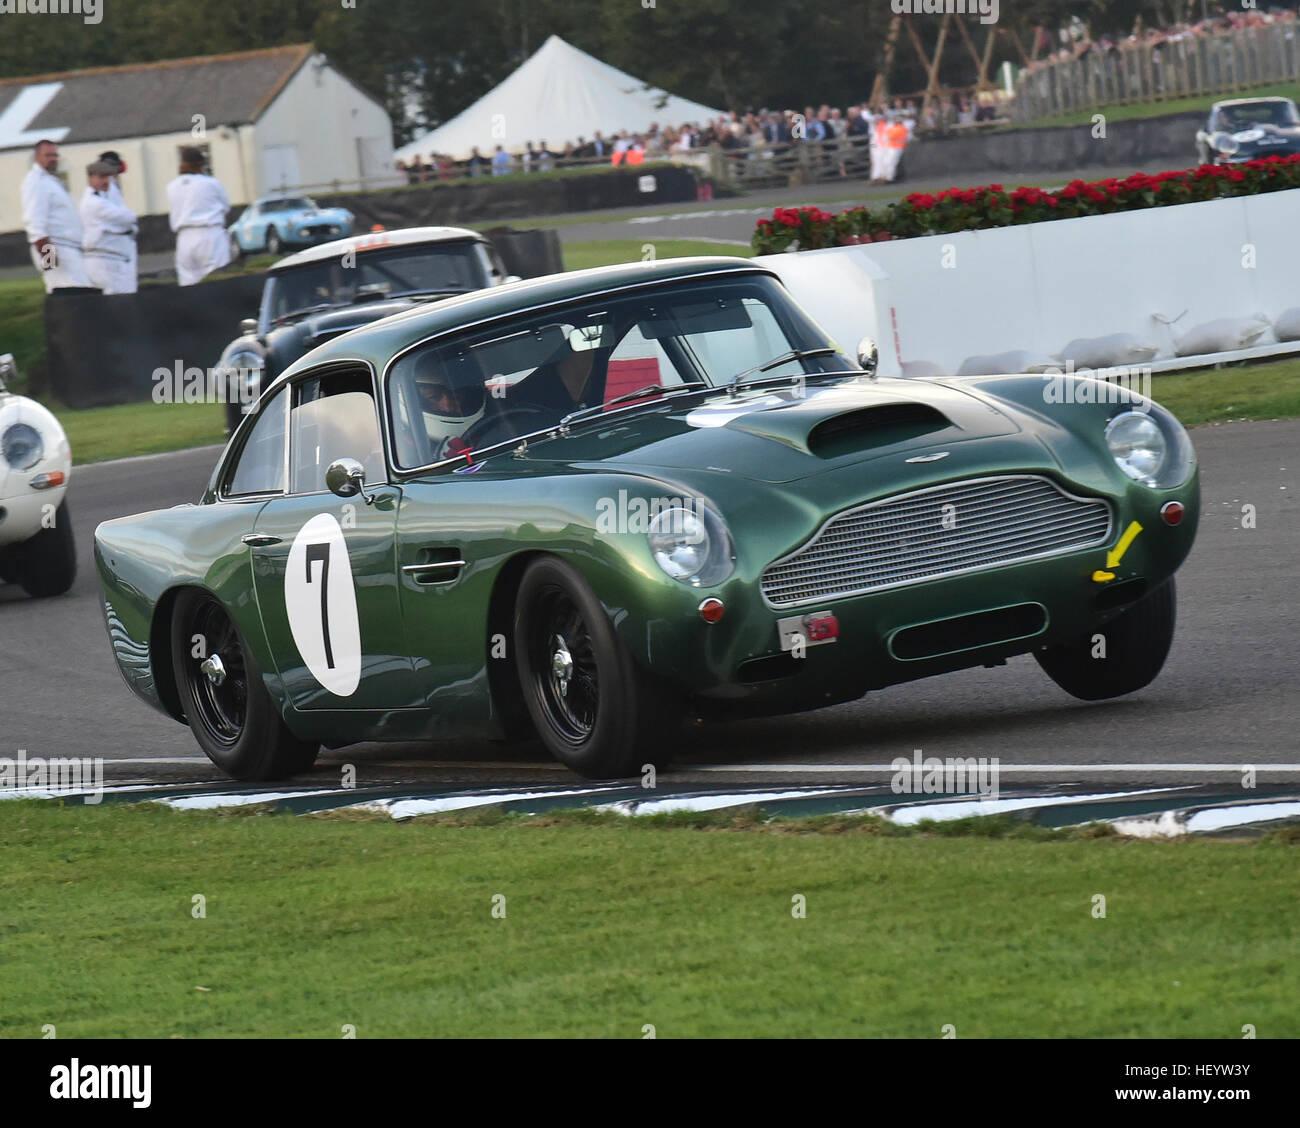 Urs Muller Arlette Muller Aston Martin Db4 Gt Kinrara Trophy Stock Photo Alamy